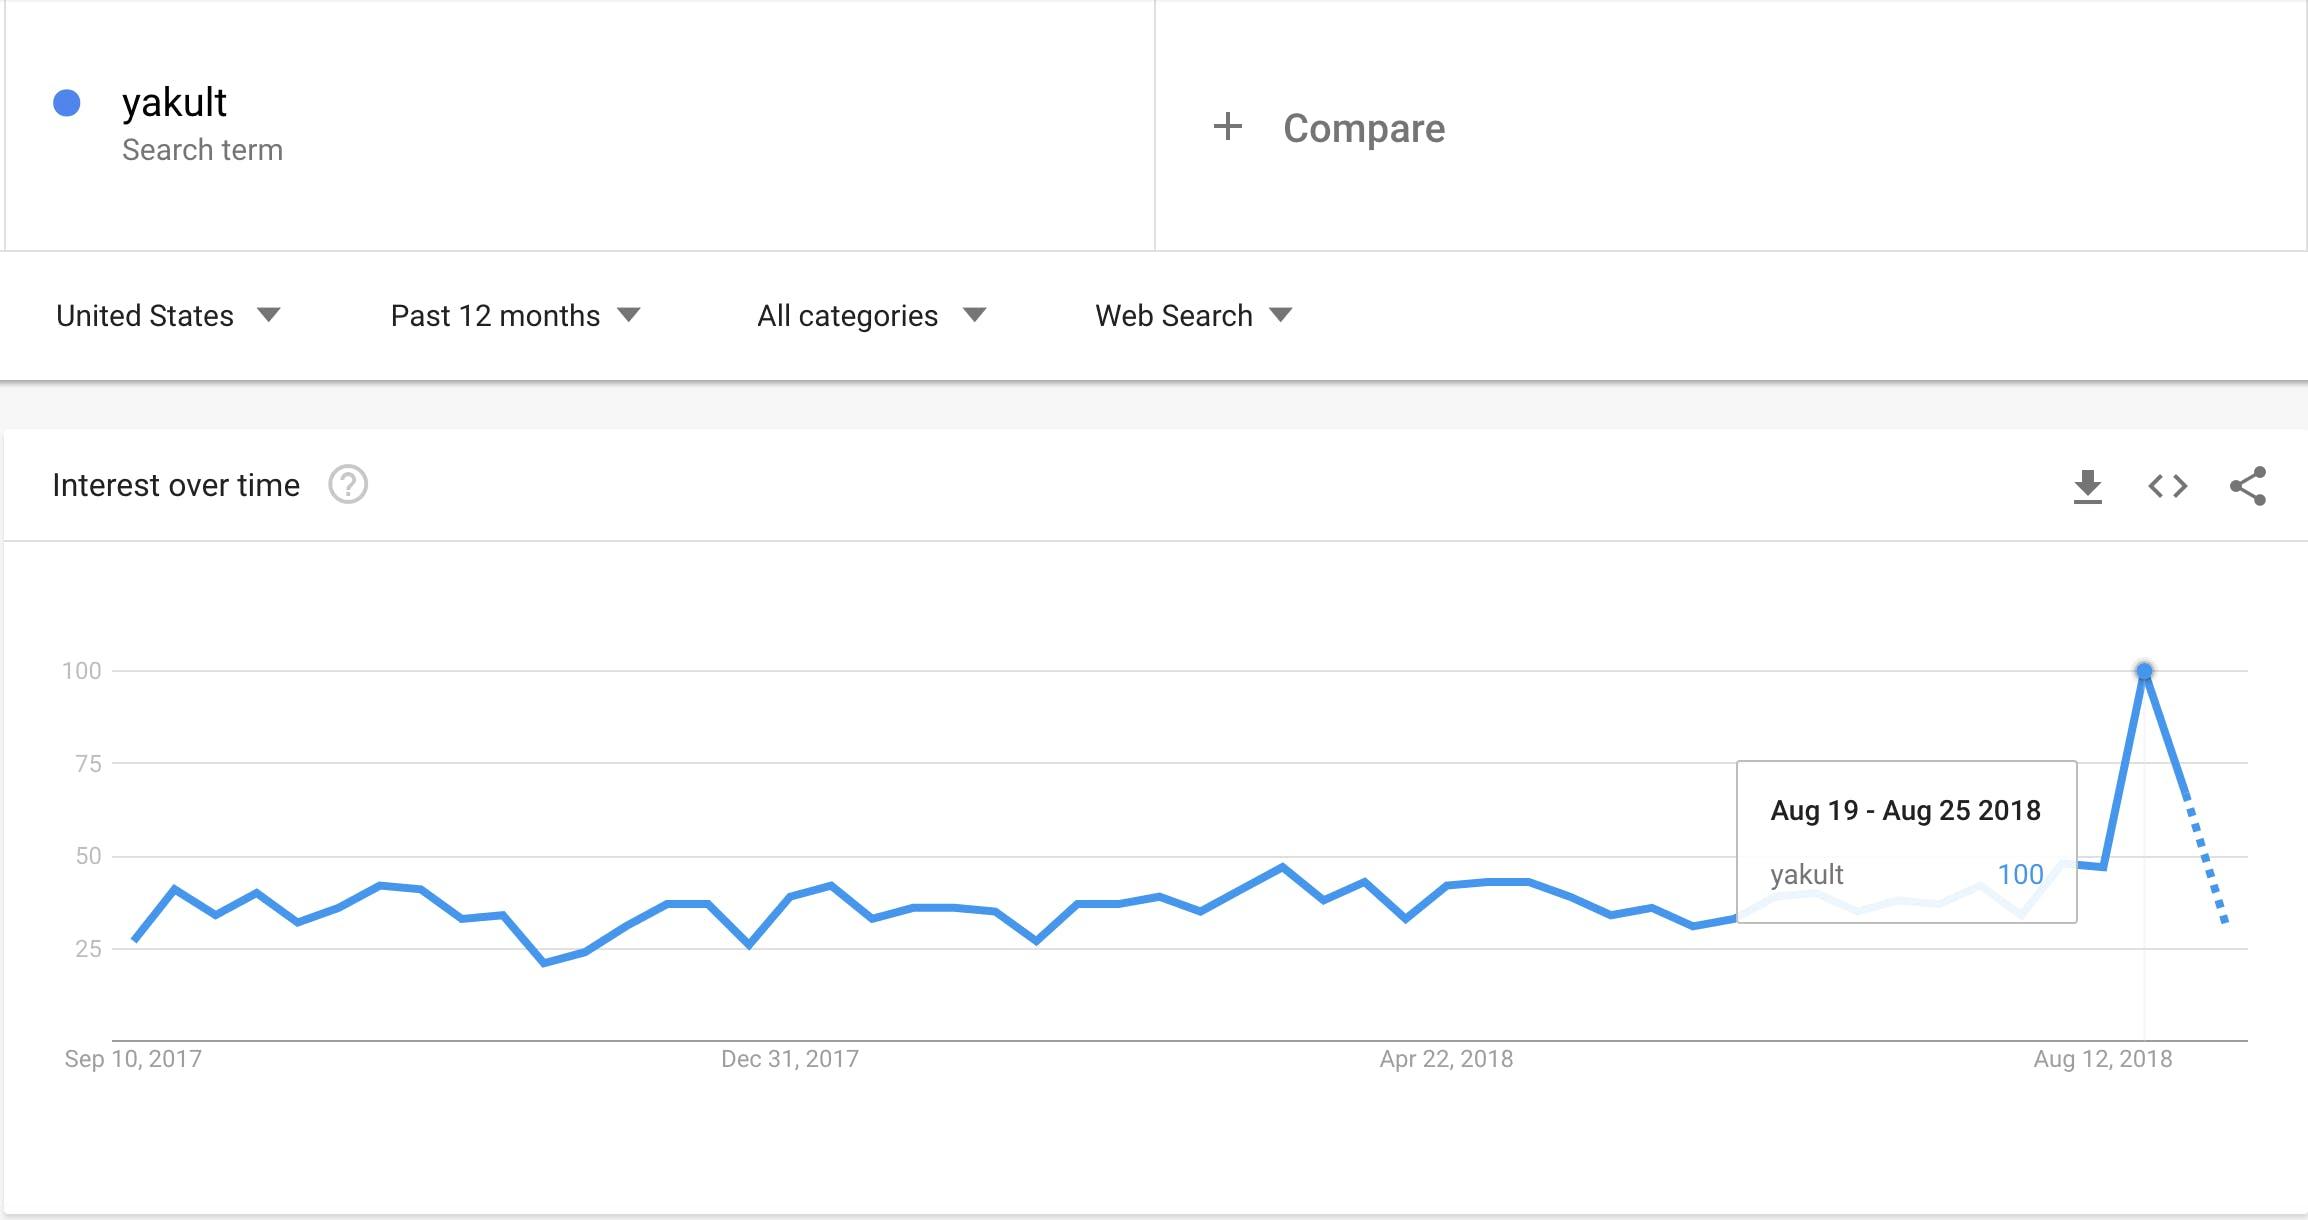 yakult google trends